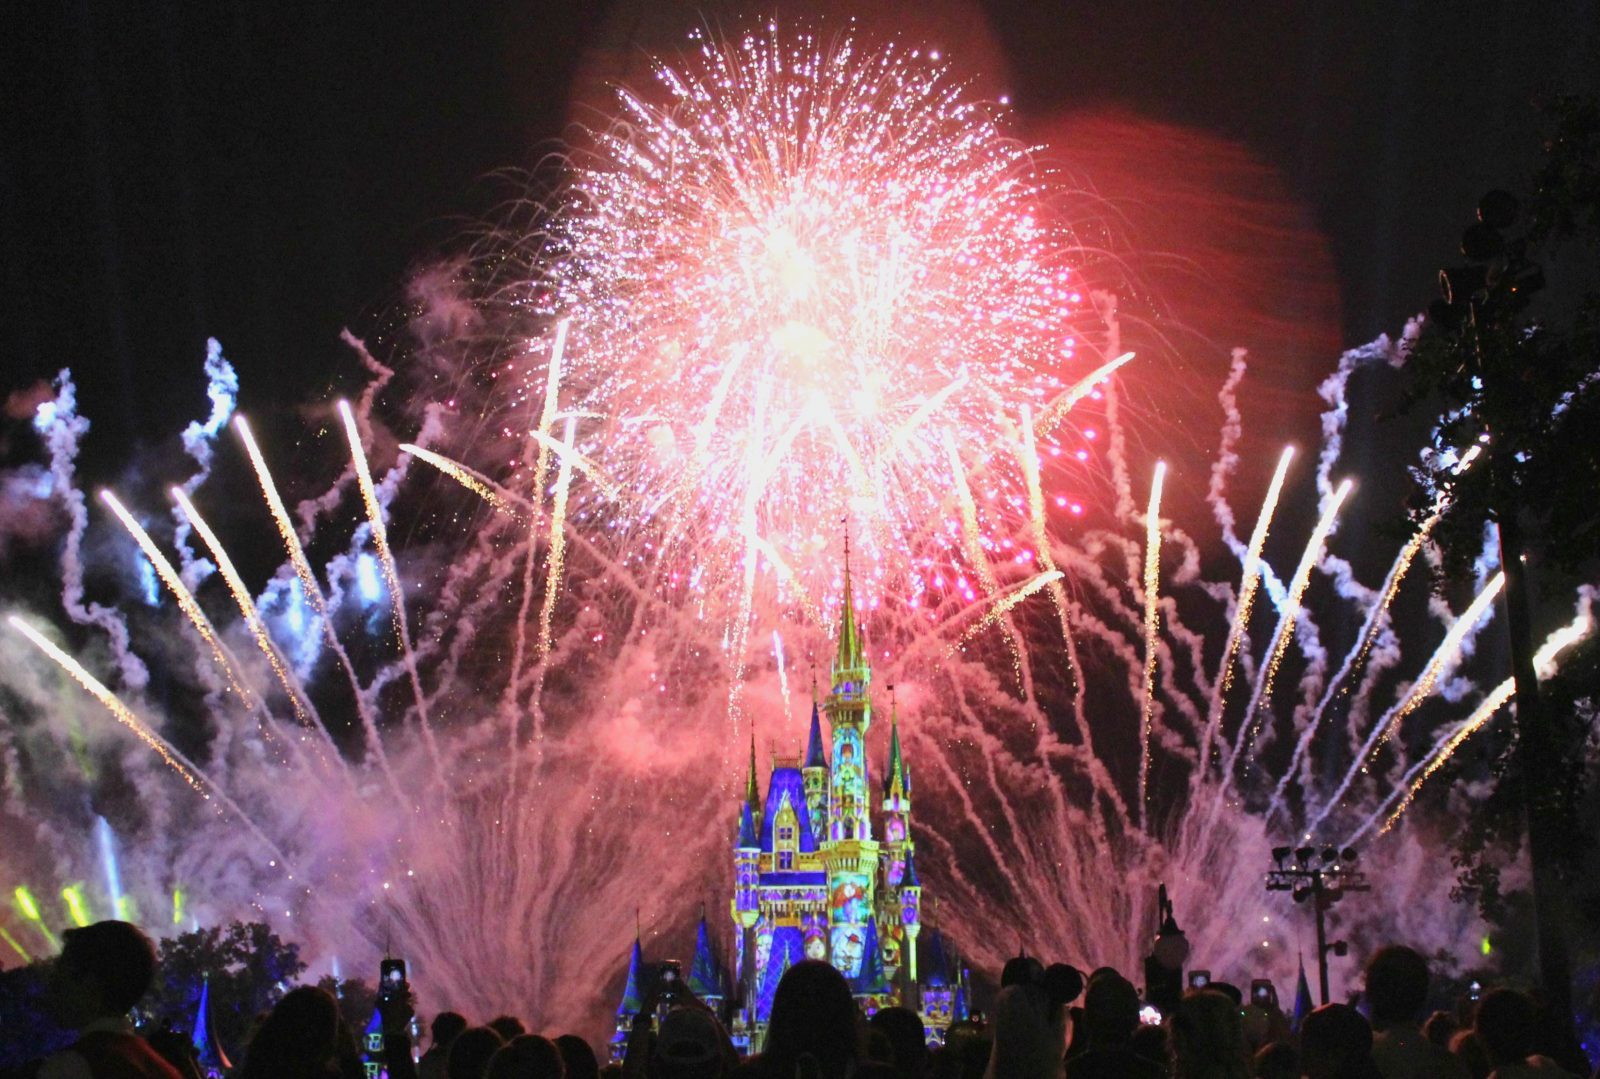 fireworks at night over cinderella's castle